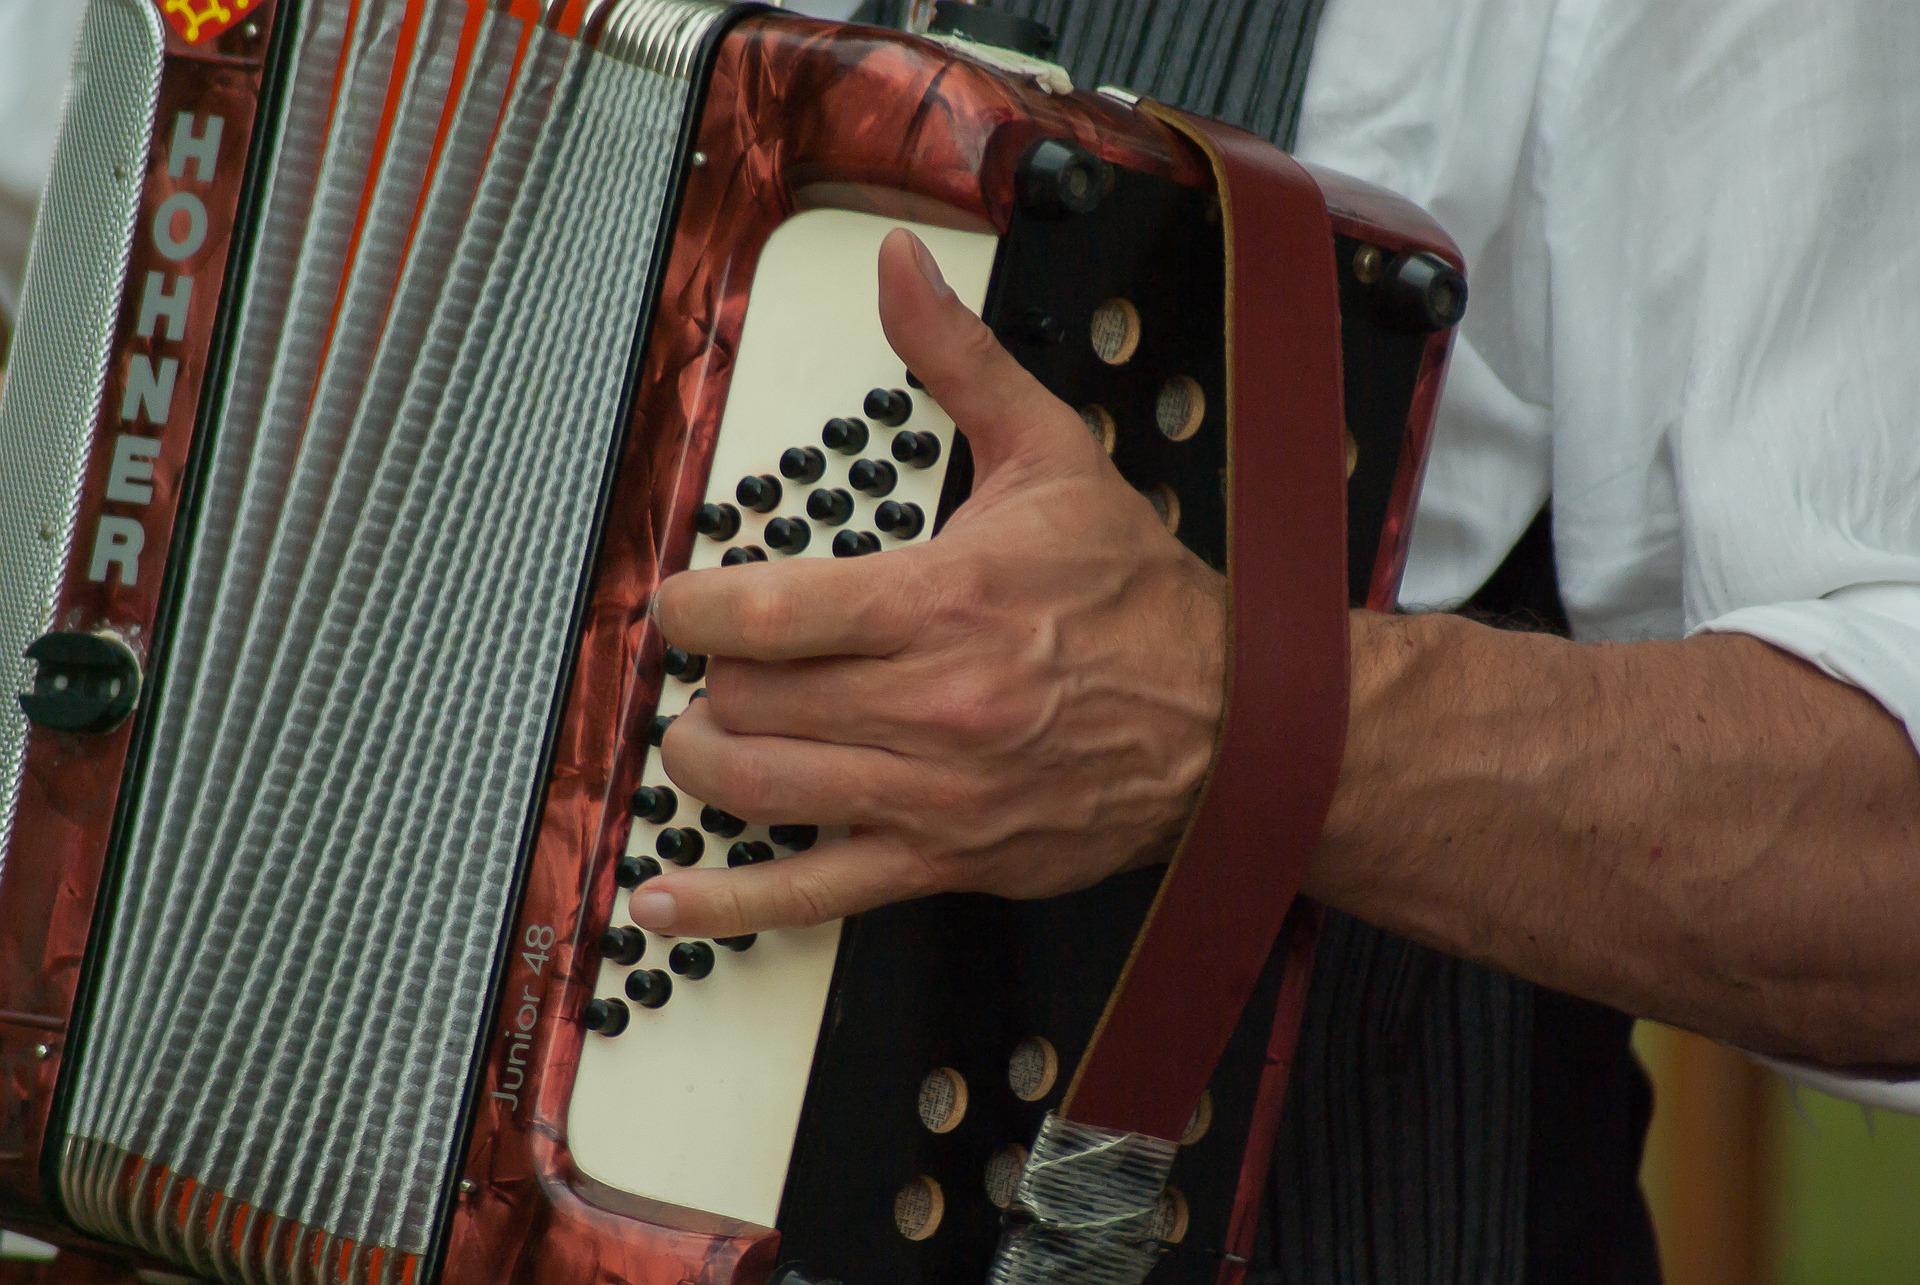 La fisarmonica di Ugo Viola